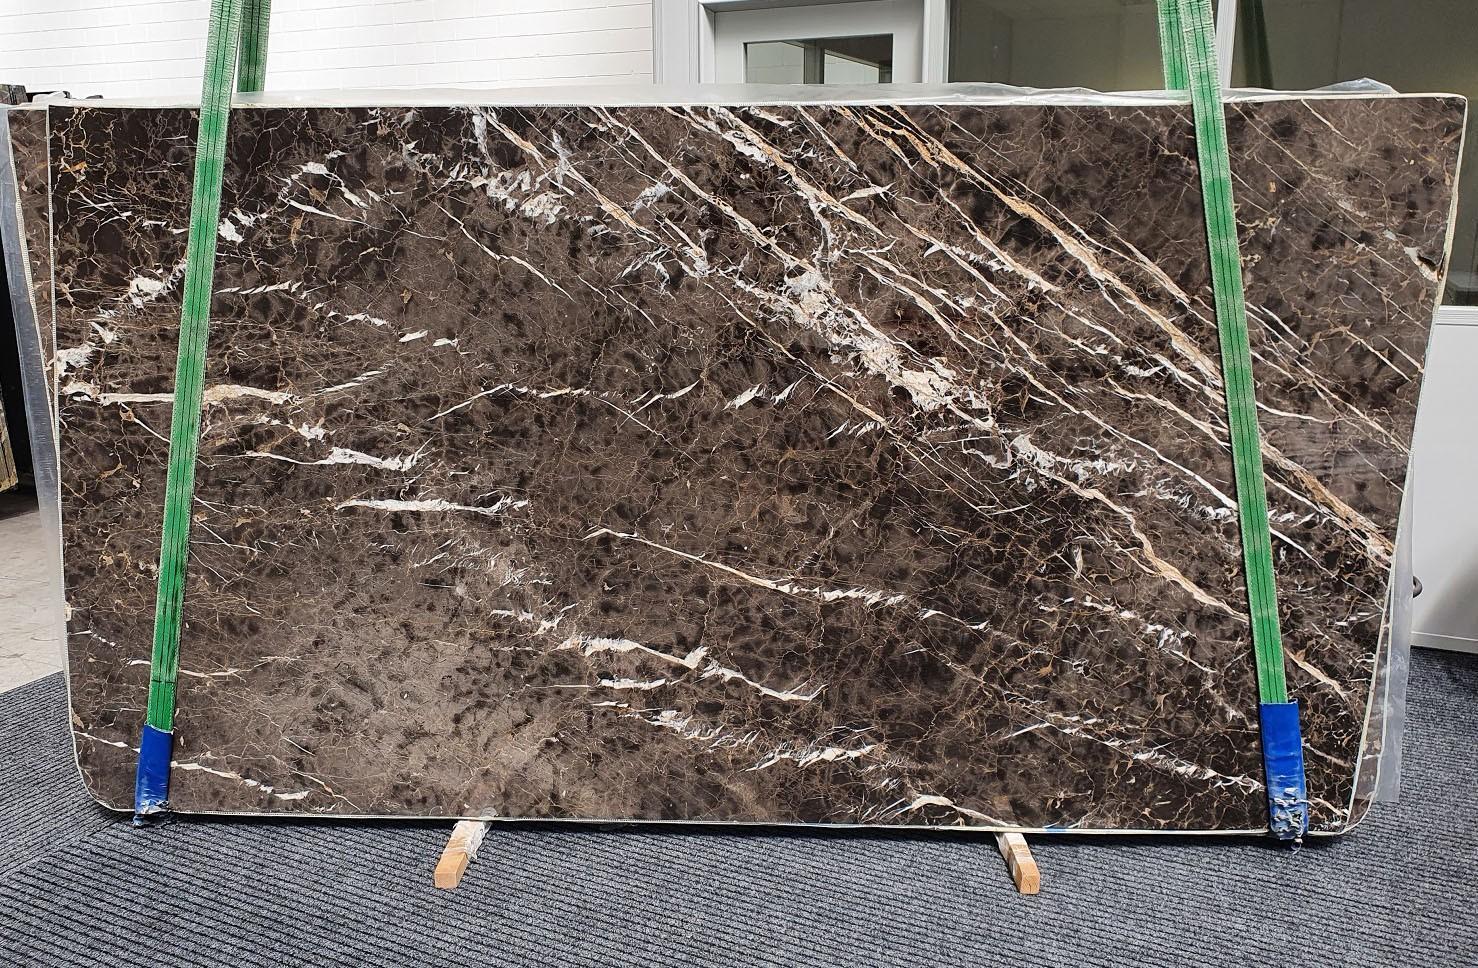 MARRON IRIS Suministro Veneto (Italia) de planchas pulidas en mármol natural 1404 , Slab #34